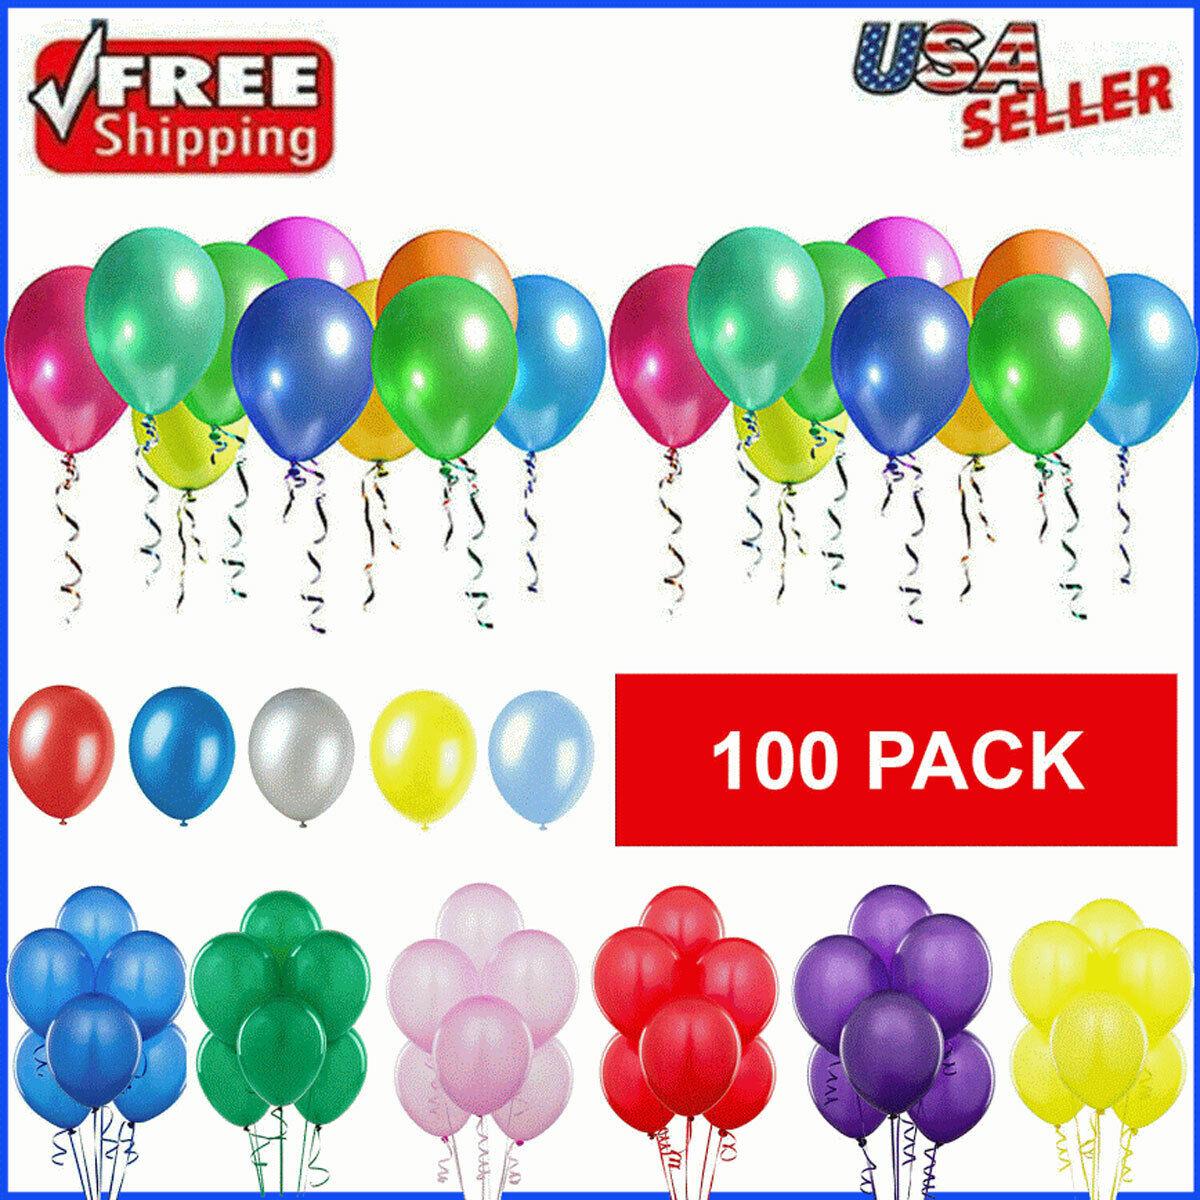 100pcs Balloons Latex Birthday Party Colorful 10 Inch Wedding Bachelorette Decor Balloons